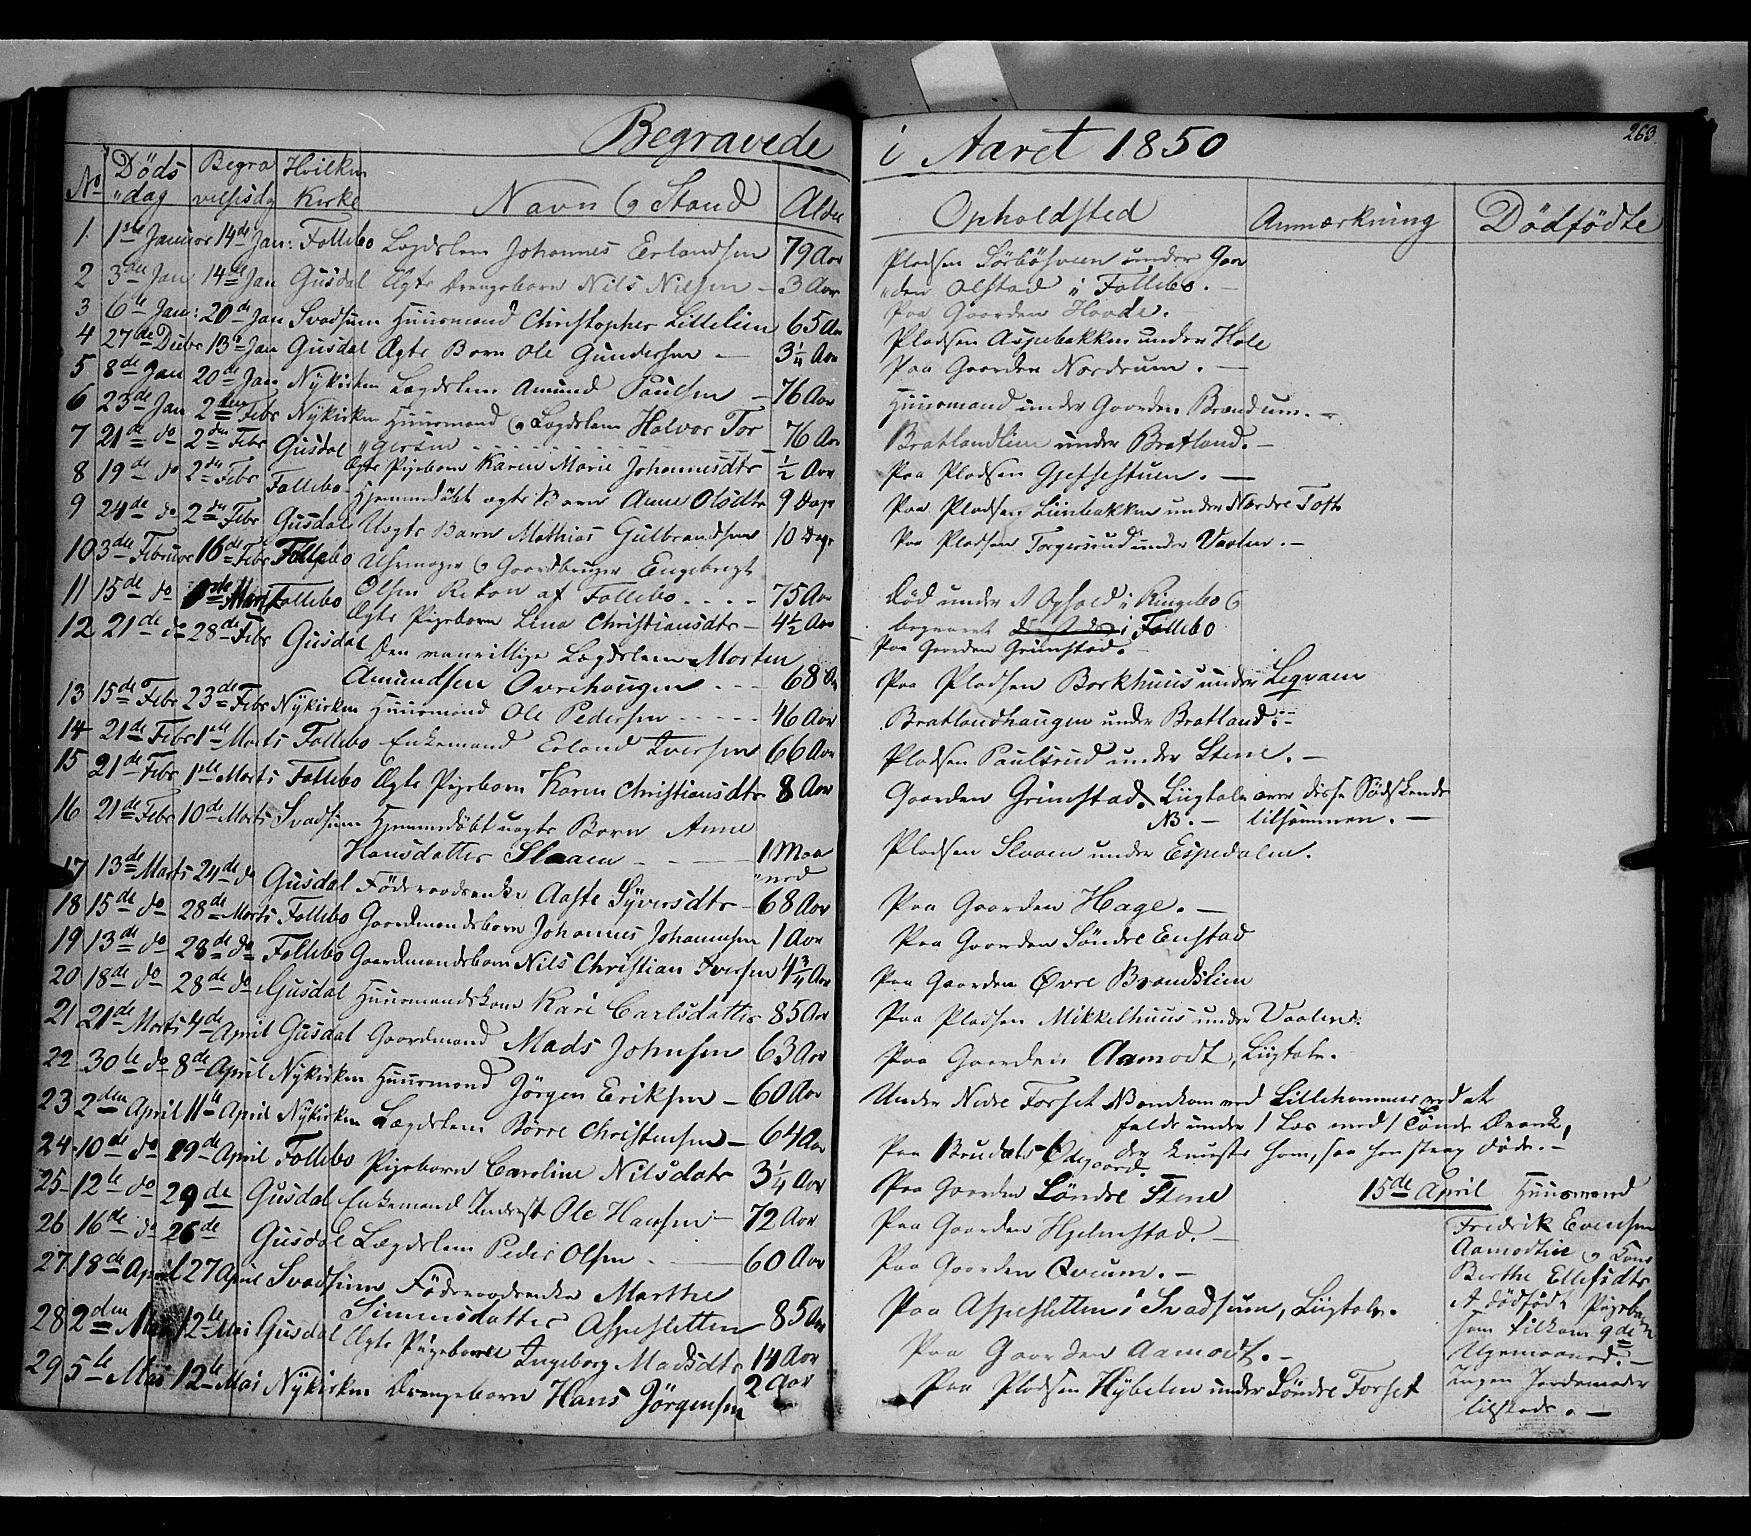 SAH, Gausdal prestekontor, Ministerialbok nr. 7, 1840-1850, s. 263